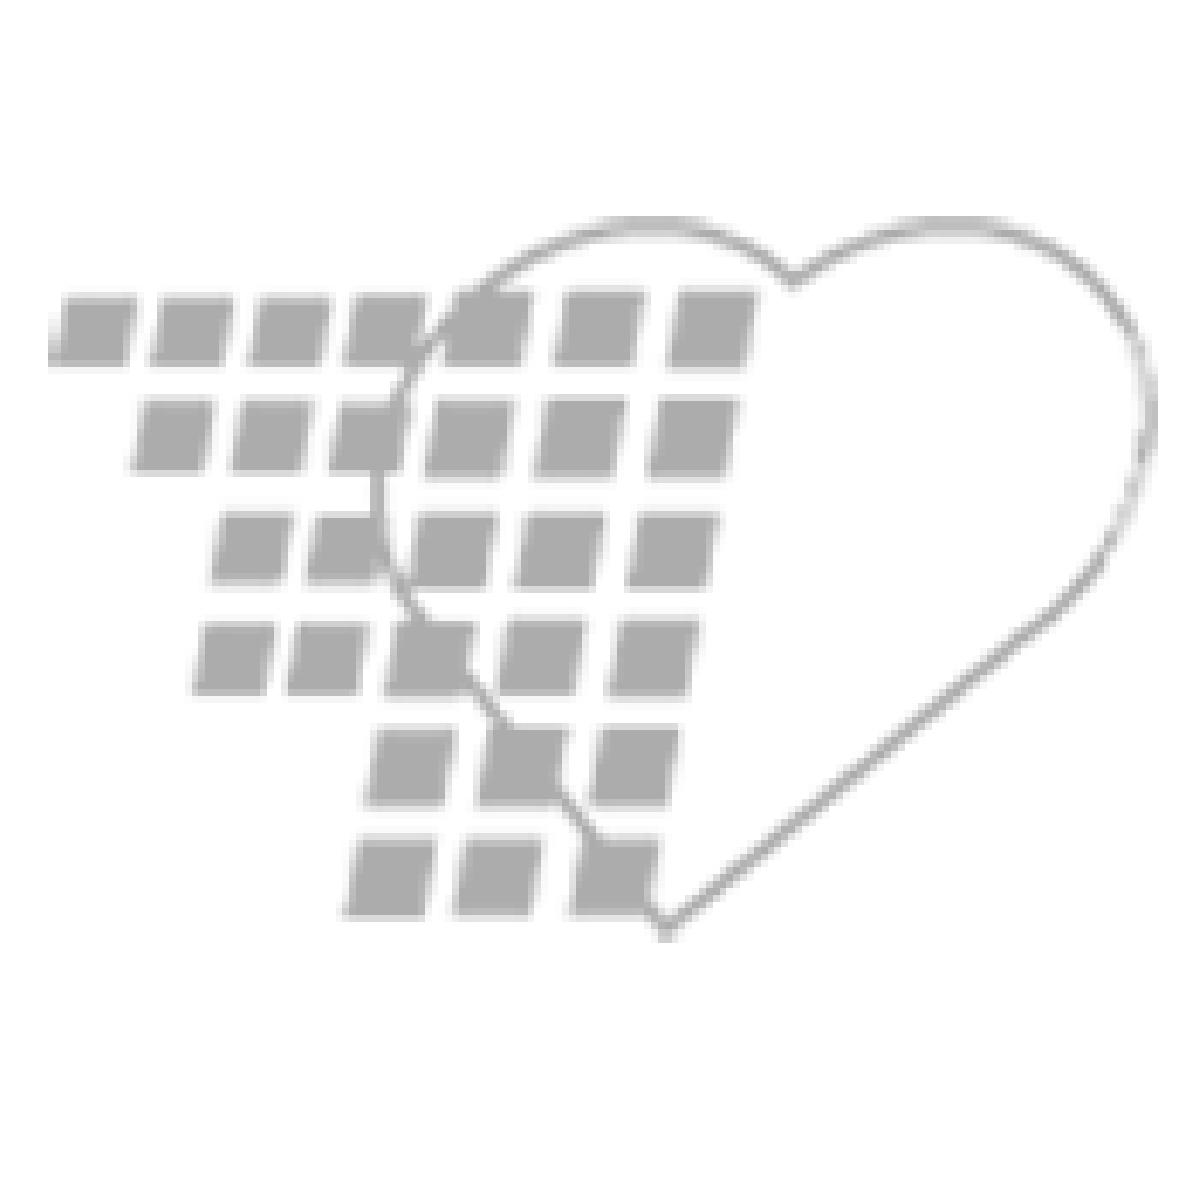 06-93-8100 - Demo Dose® RSI Kit